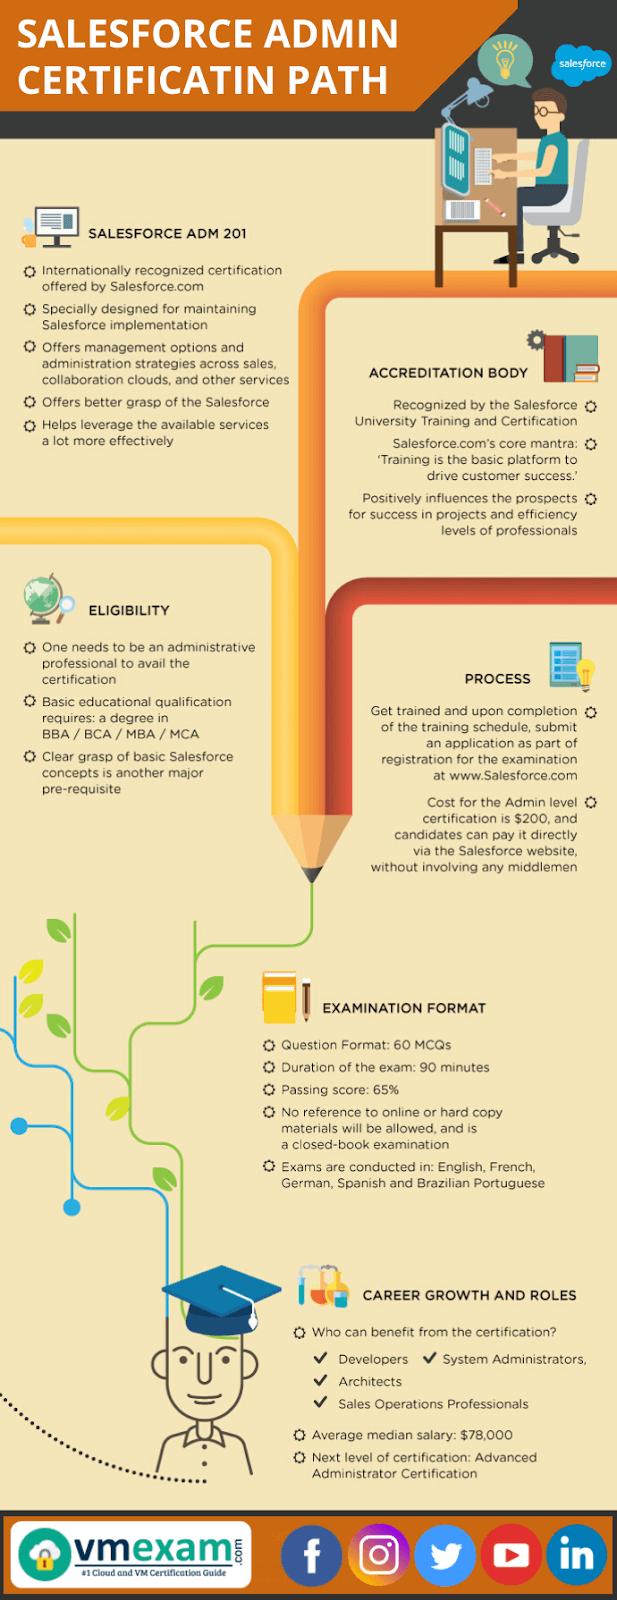 Salesforce Admin Certification Path